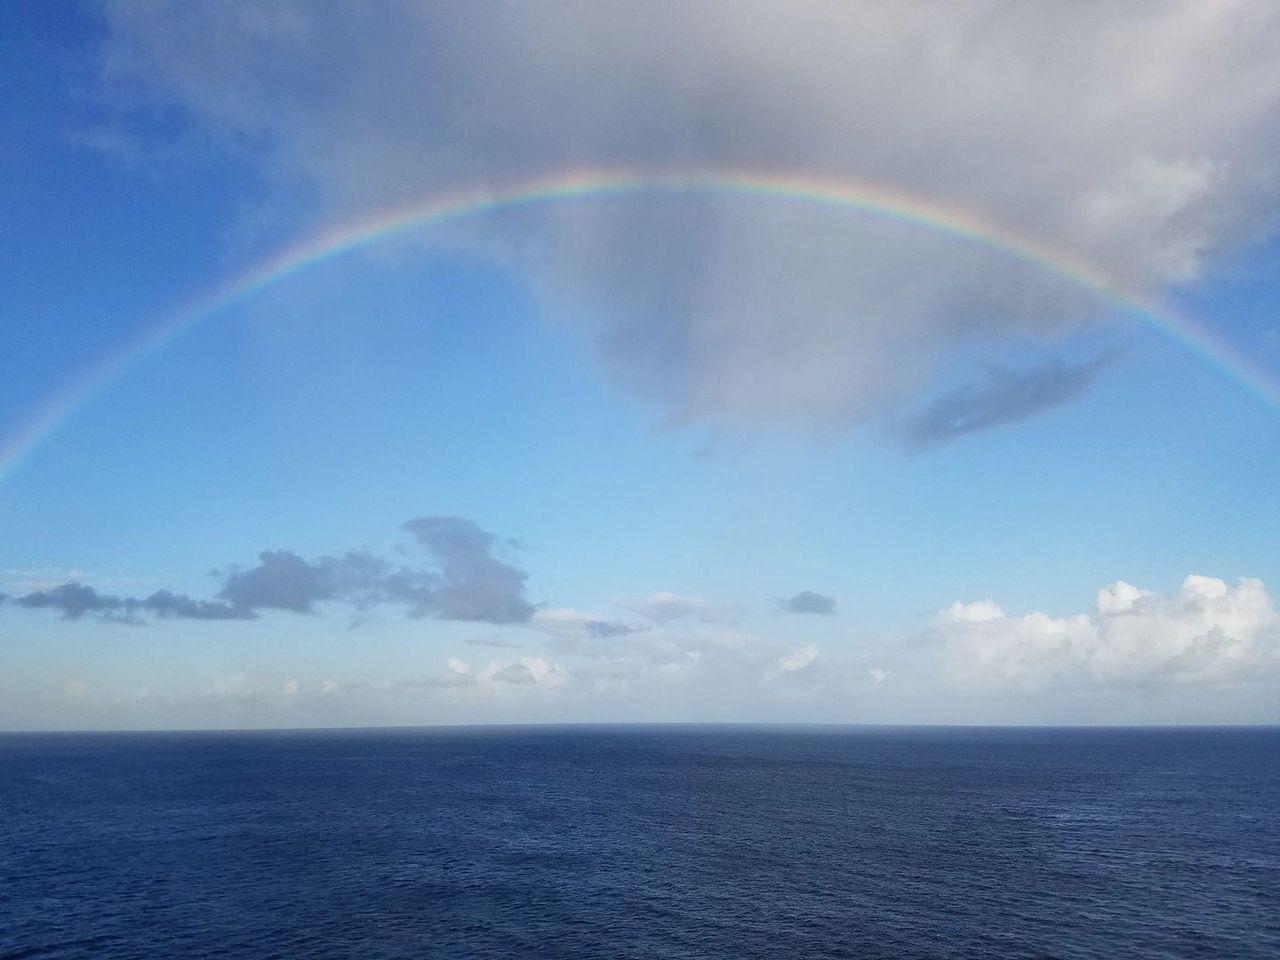 Full rainbow over open ocean